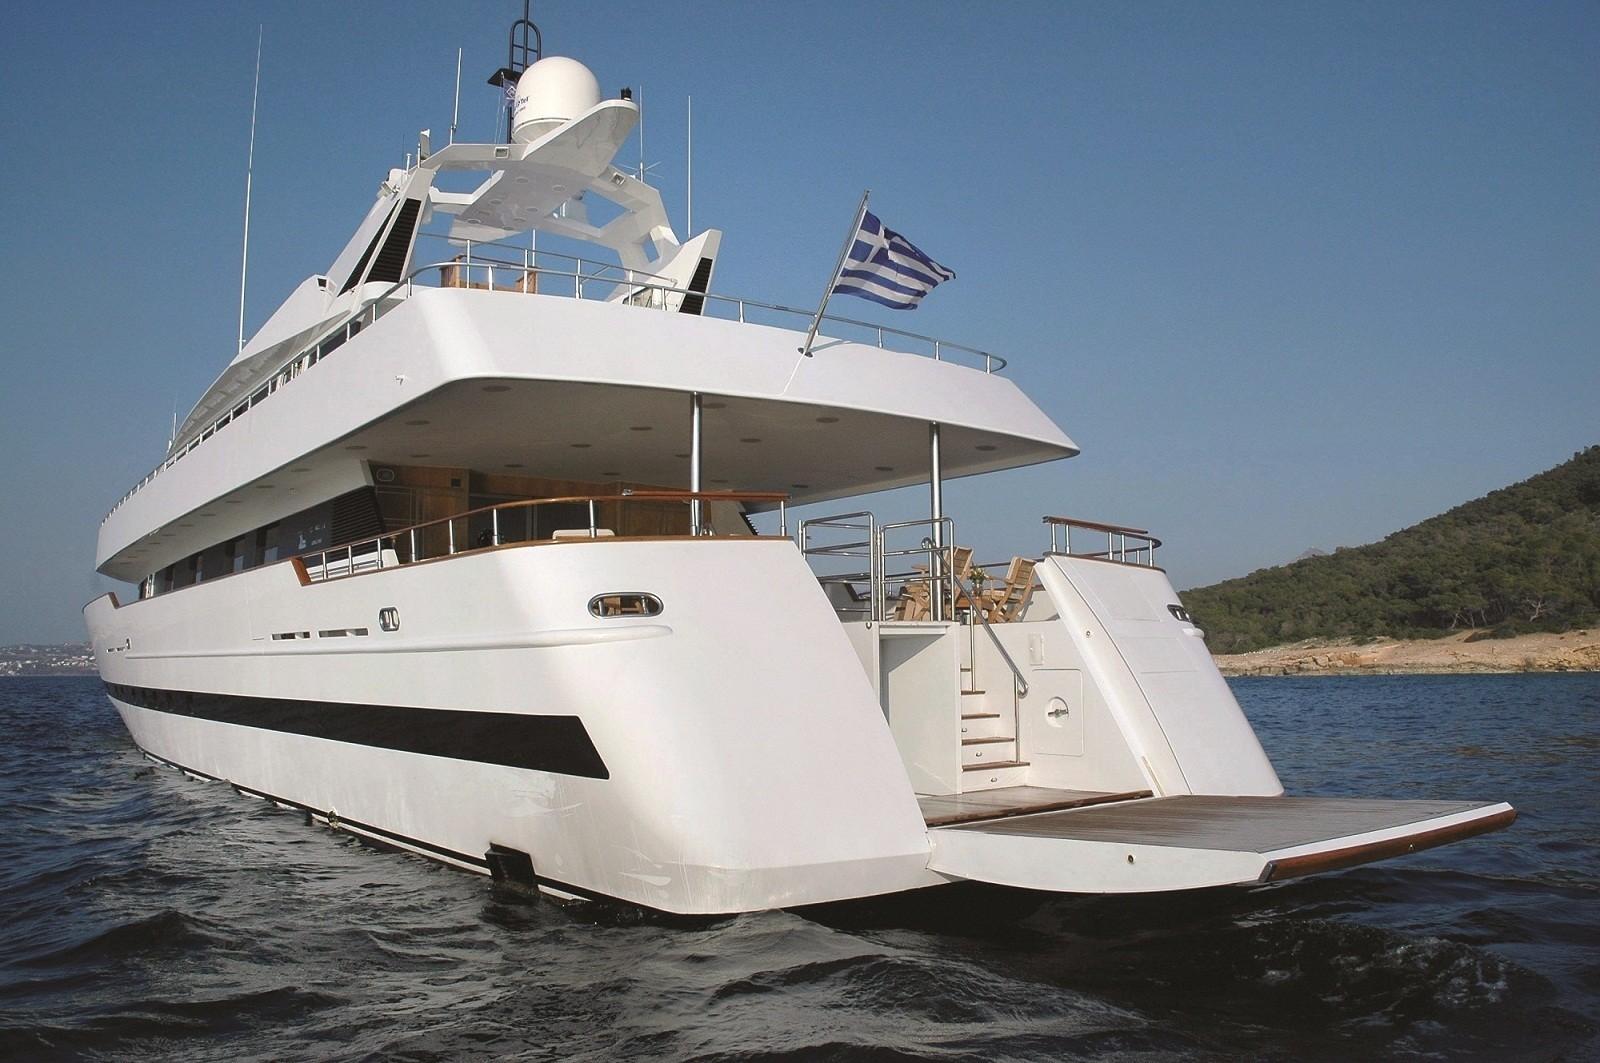 Swimming Landing Extended Aboard Yacht BELLA STELLA